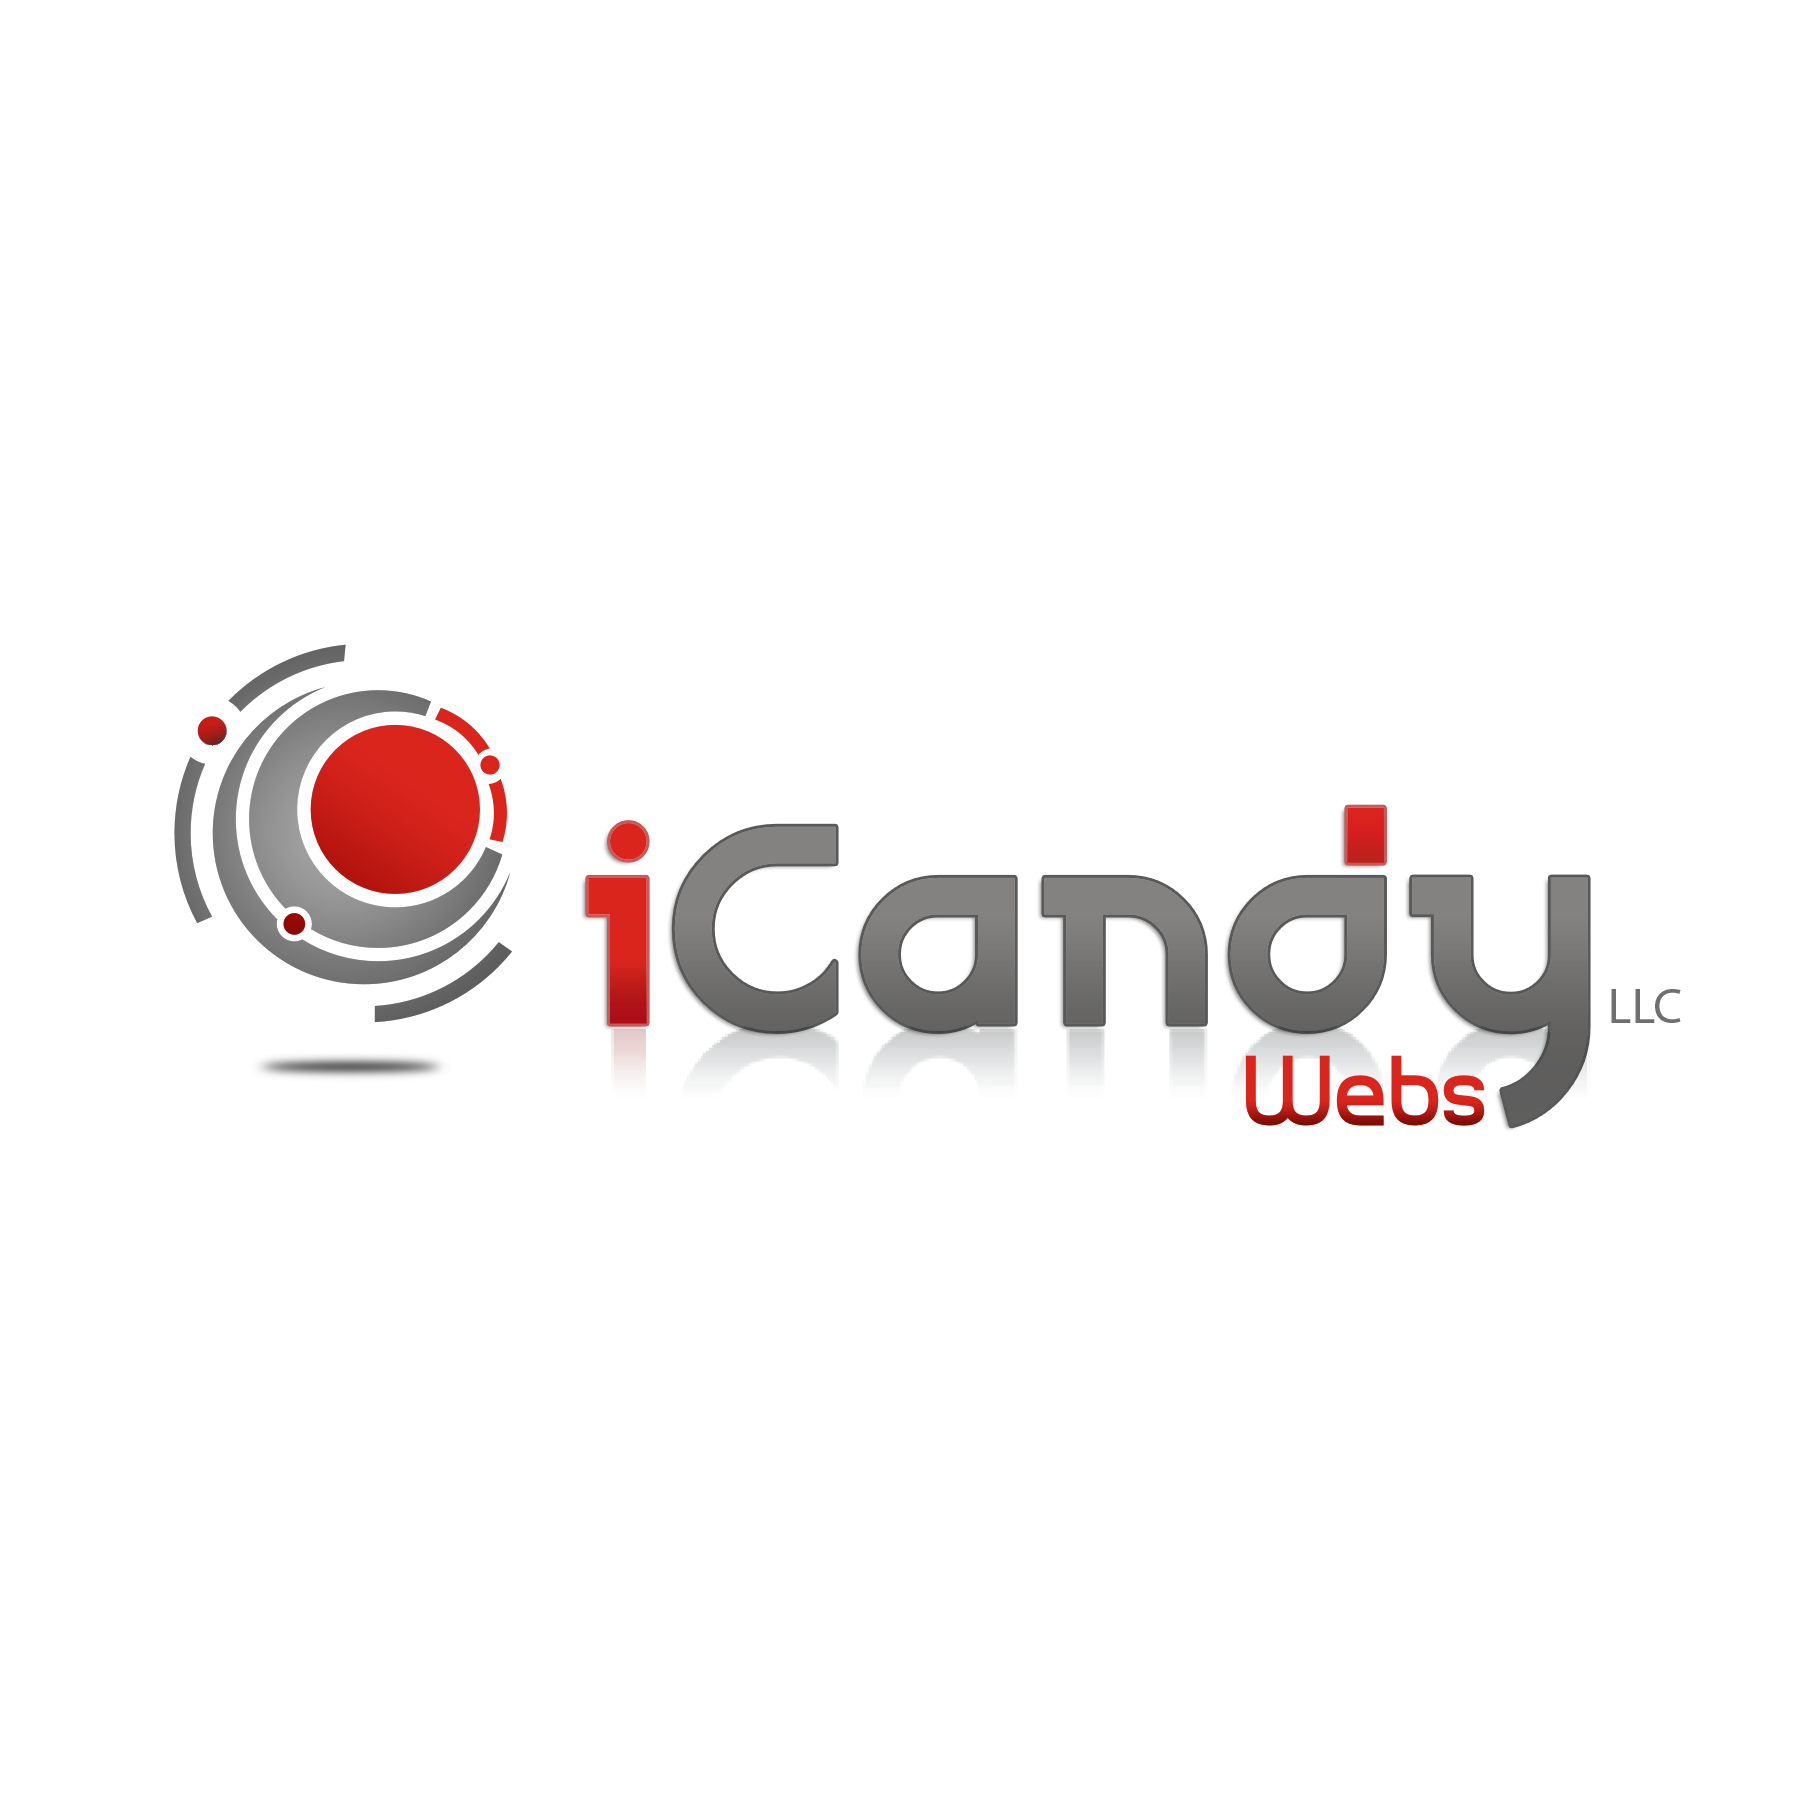 iCandy Webs, LLC